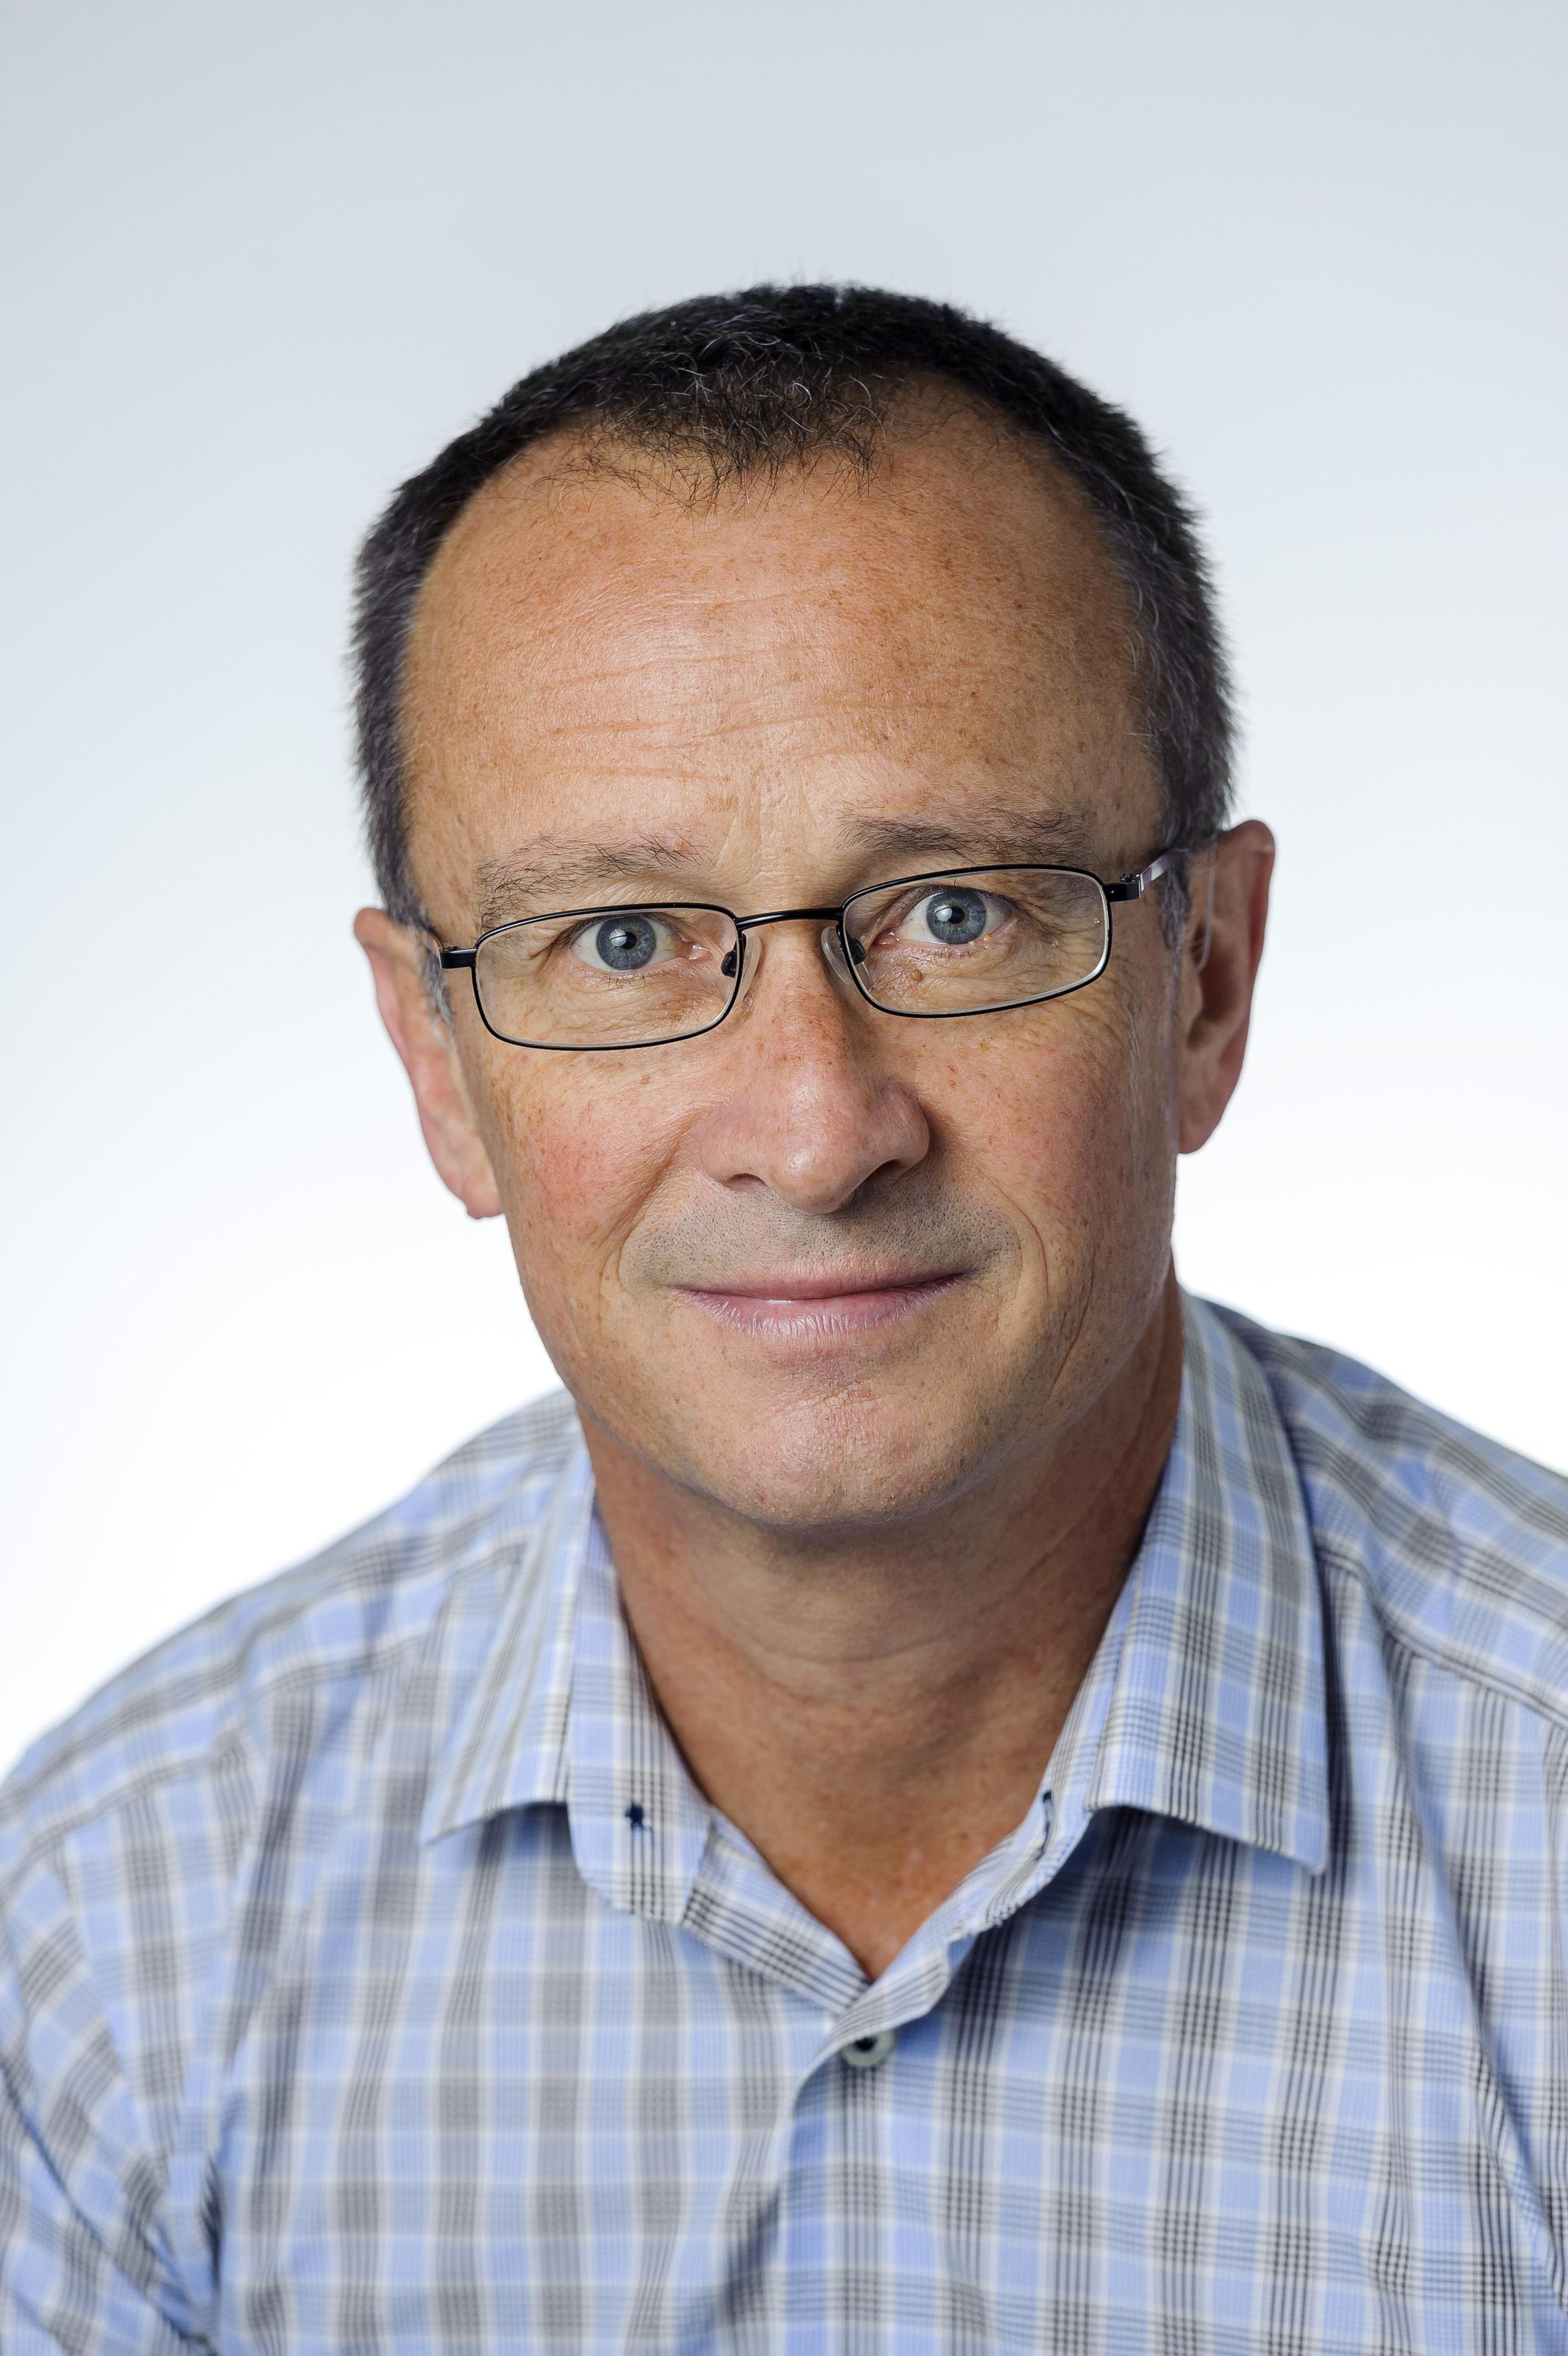 Scott Cozens - General Manager